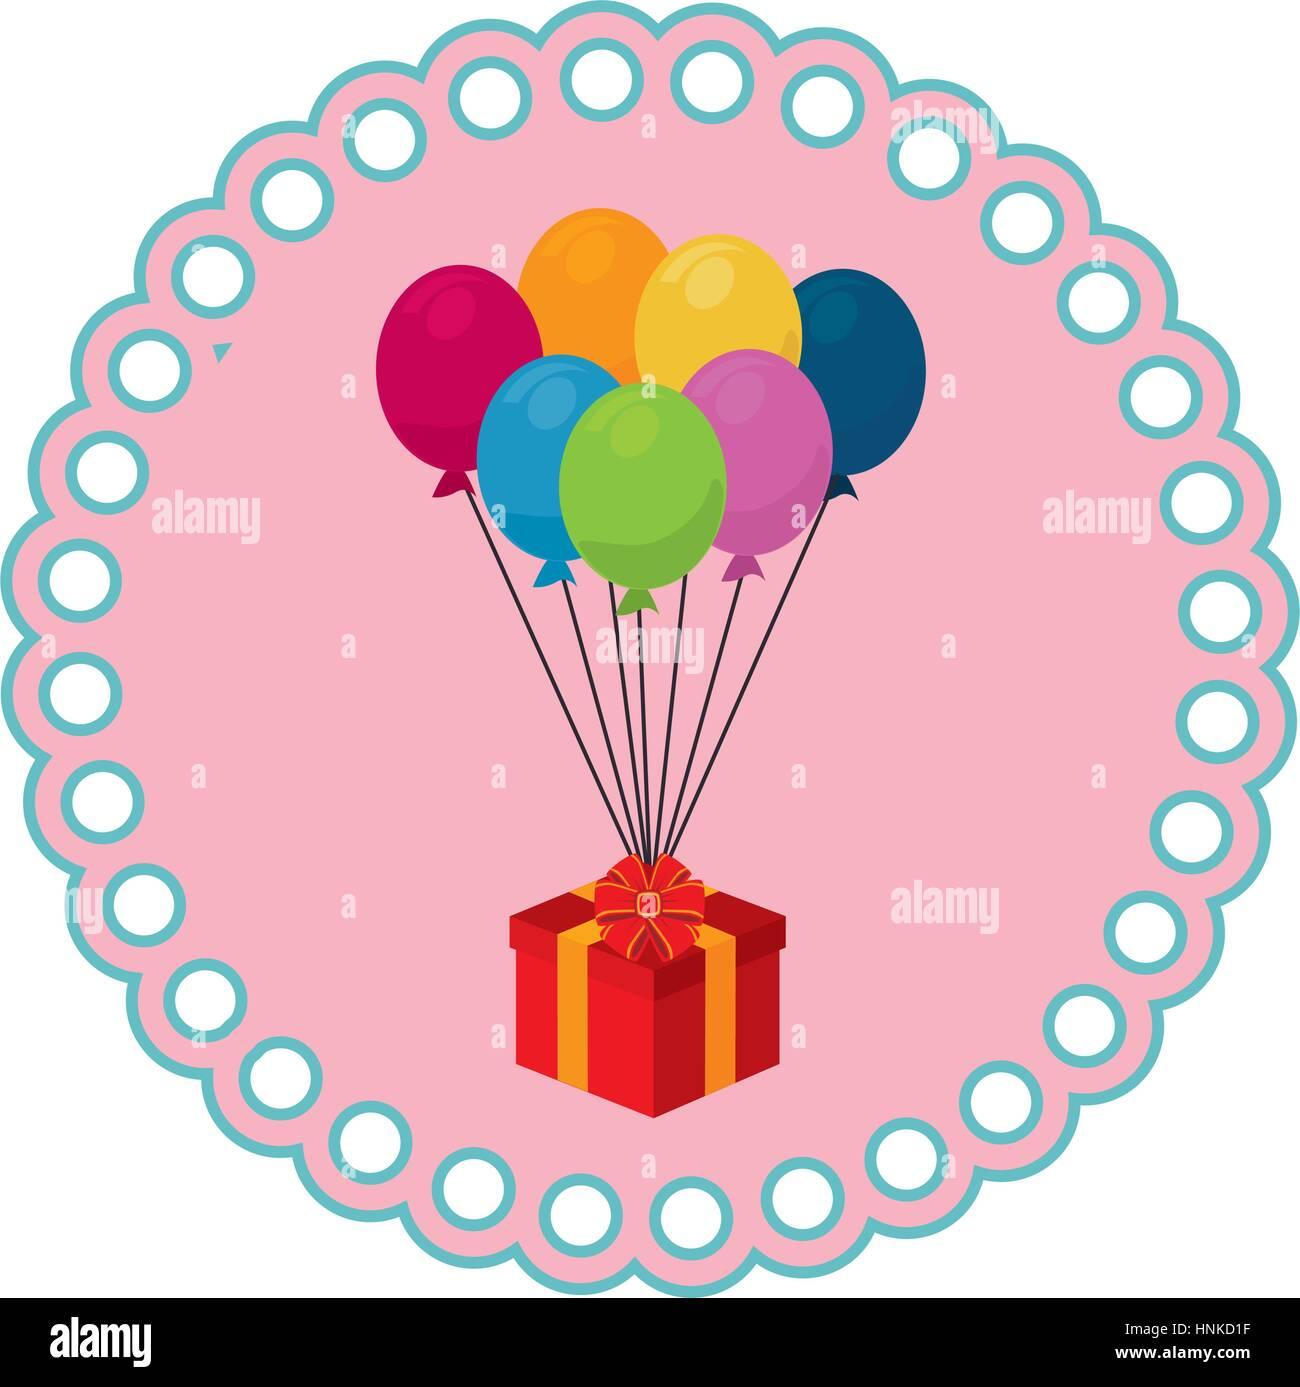 Helium Balloon Box Stockfotos & Helium Balloon Box Bilder - Seite 2 ...